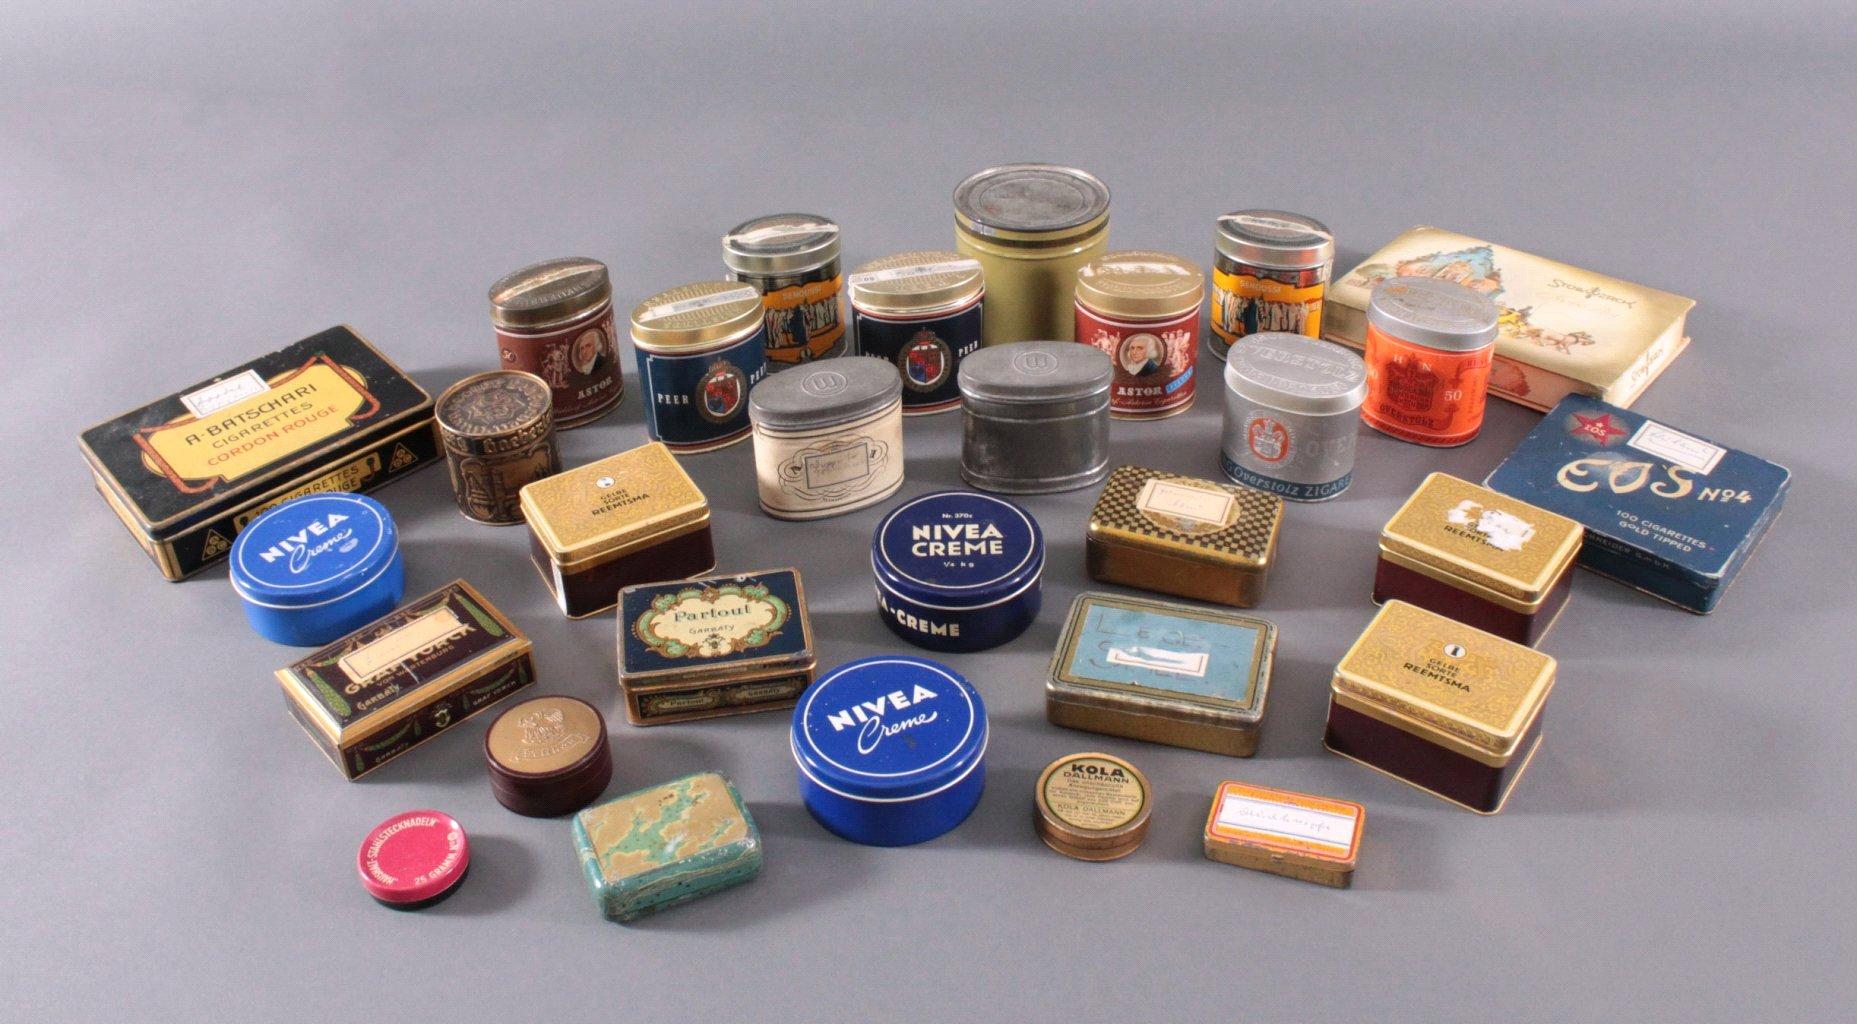 Sammlung Blechdosen und Pappschachteln